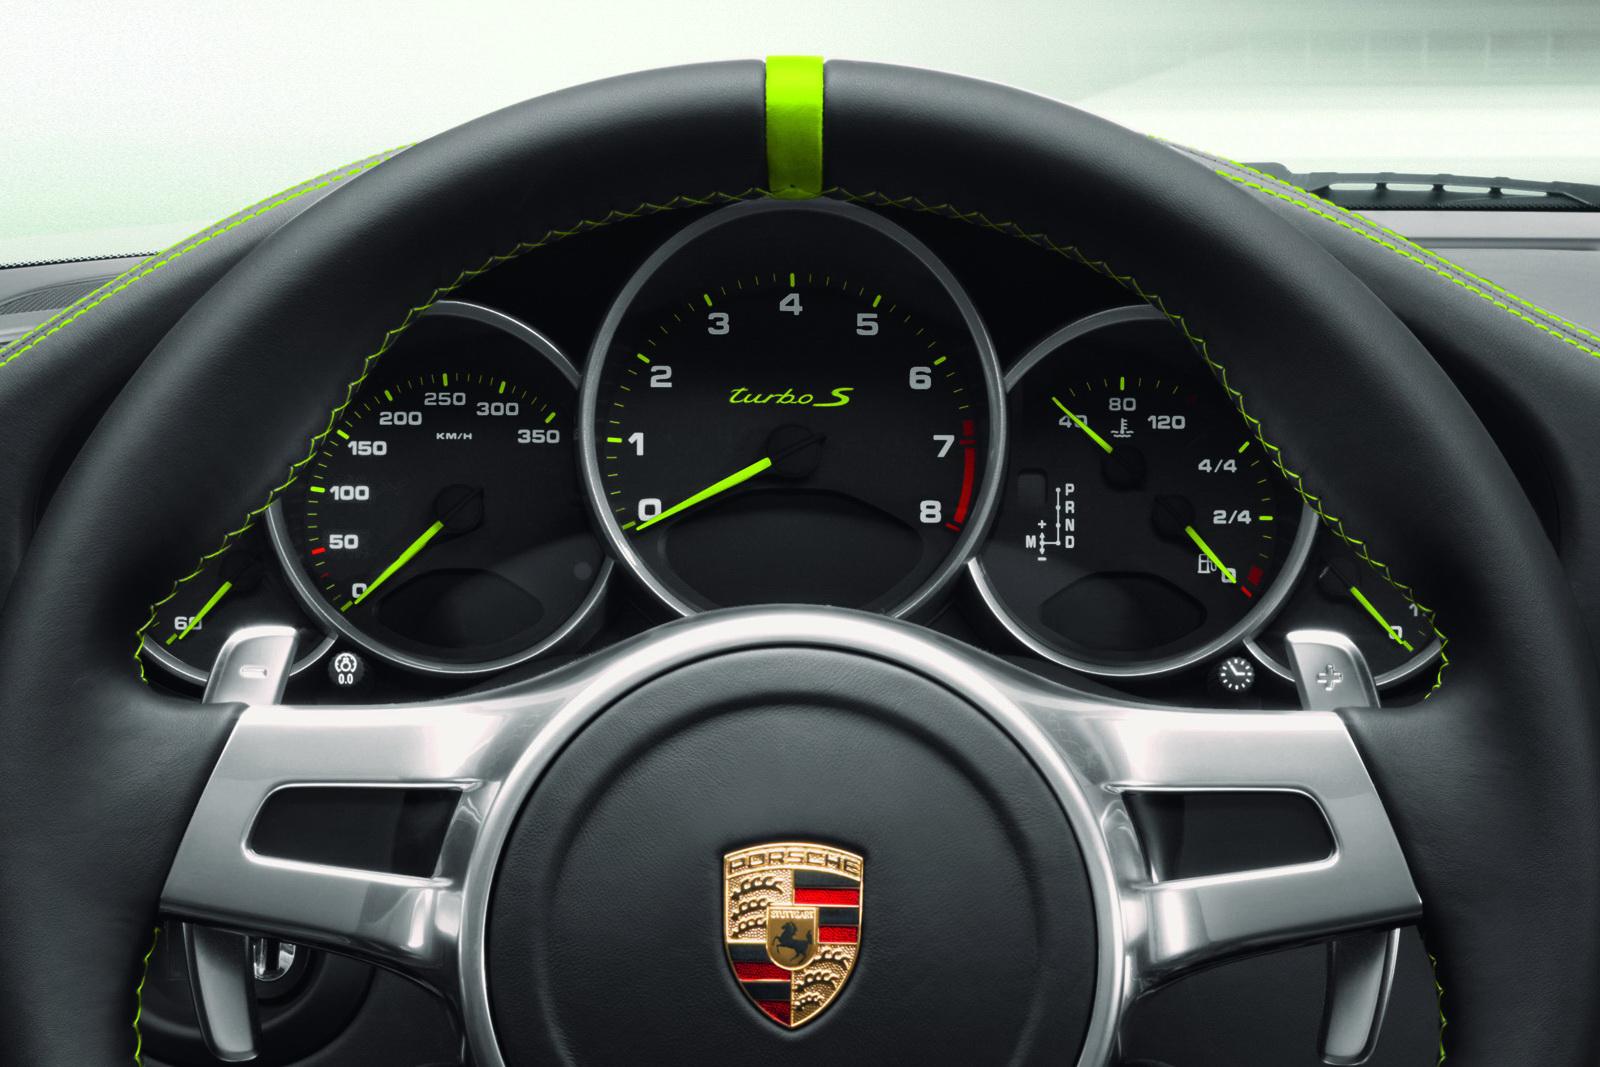 porsche 911 turbo s 918 spyder wallpapers - Porsche 911 Turbo S Edition 918 Spyder Caricos